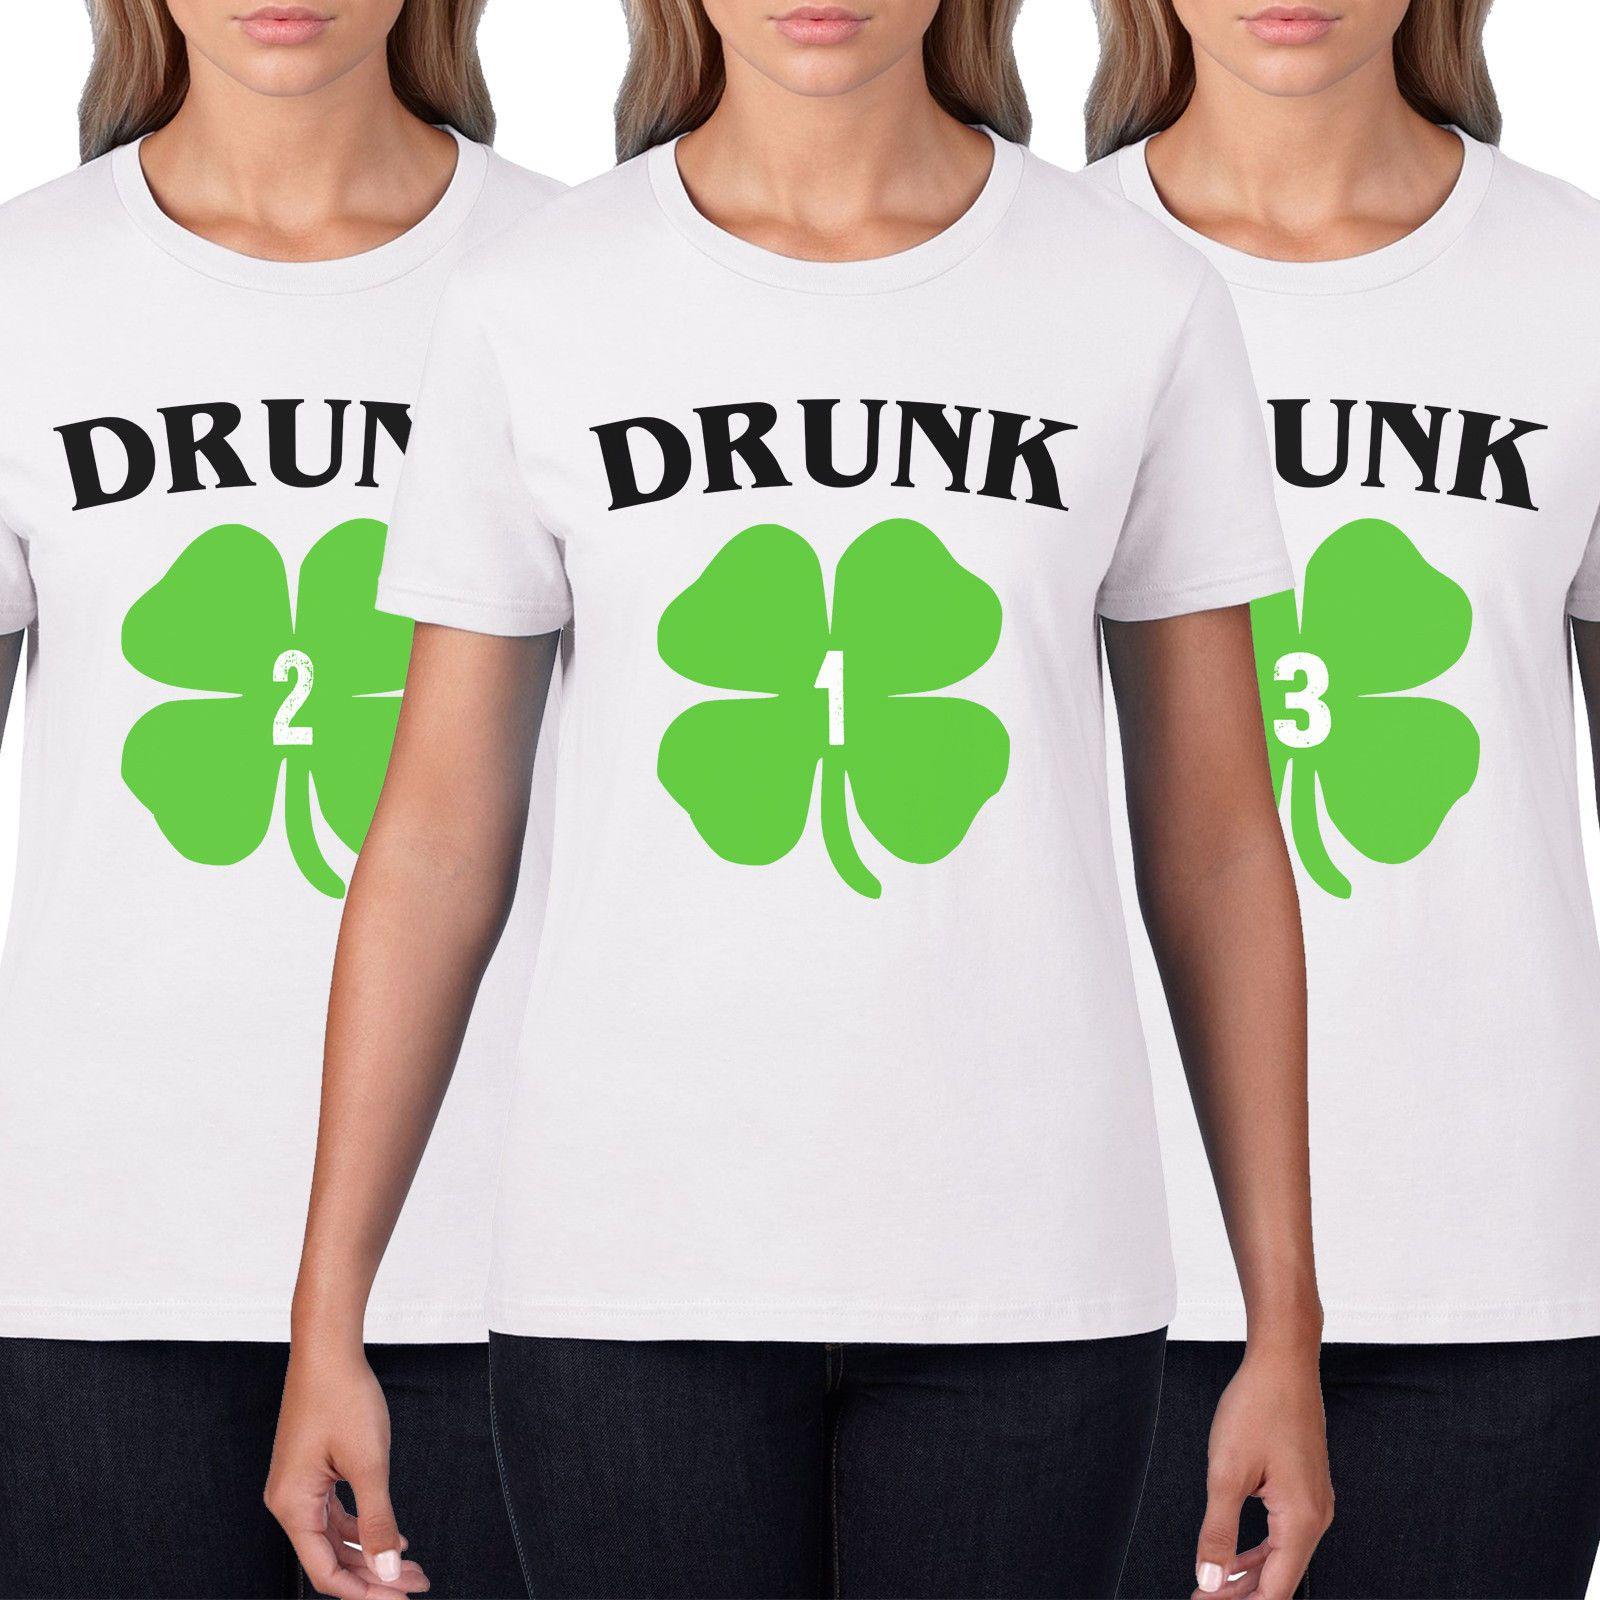 dcc4bee0e Drunk 1 Drunk 2 Womens Funny Best Friend St Patricks Day T Shirt Men  Ireland P28 Men Women Unisex Fashion Tshirt Cheap T Shirt Design Your T  Shirt From ...